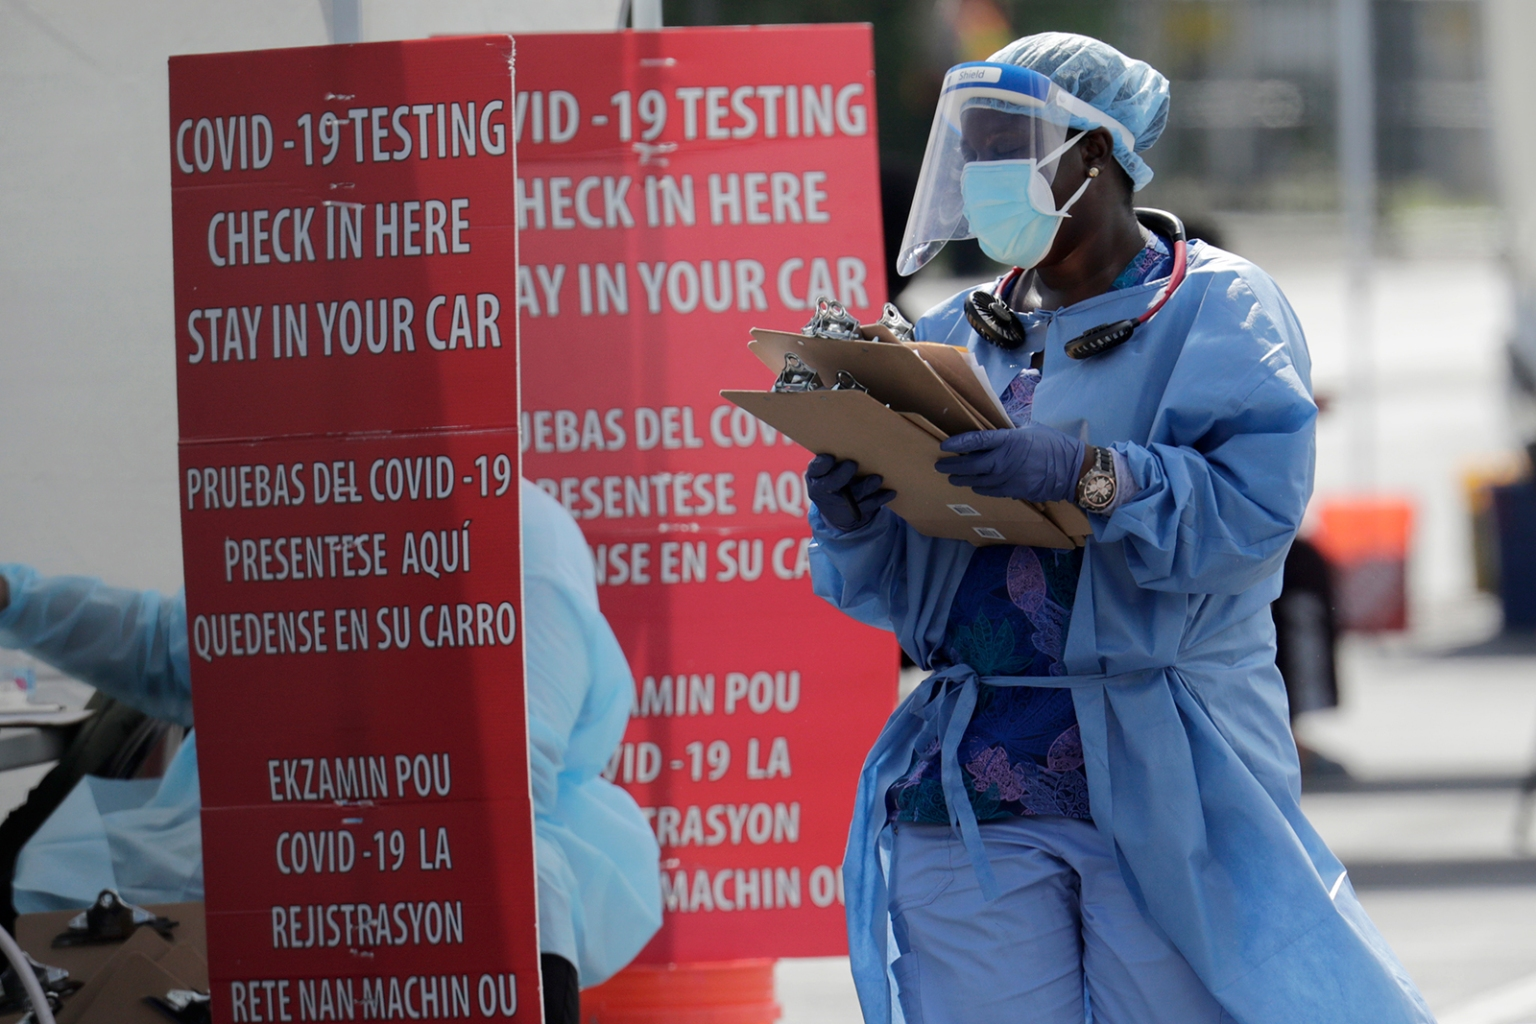 Free Coronavirus Testing Planned This Week in the Coachella Valley